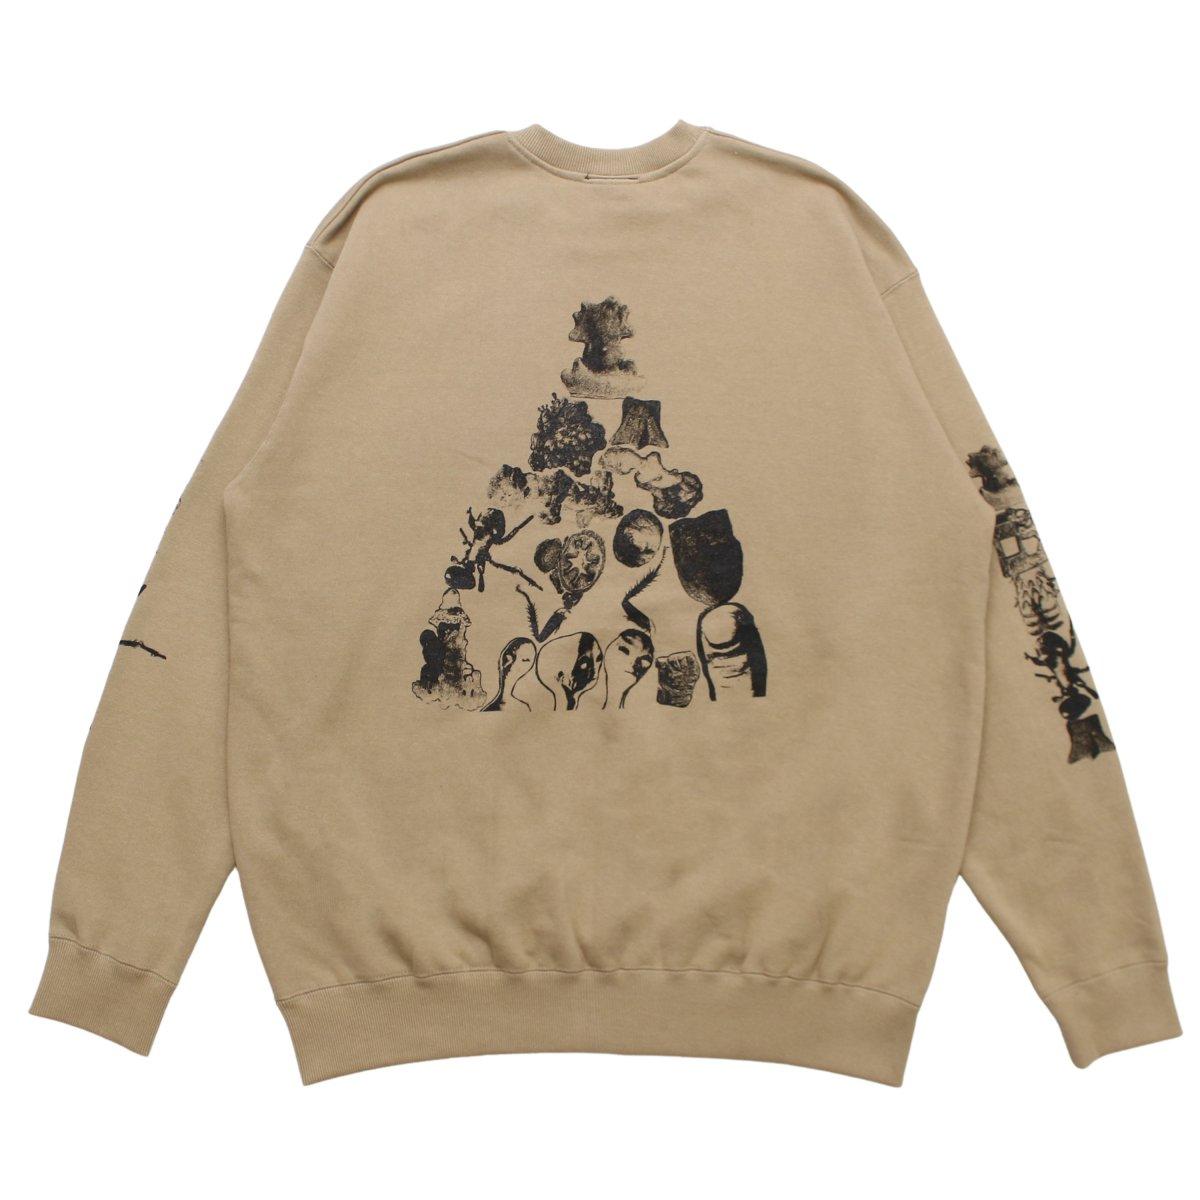 Ed Davis x BIEN Sweatshirt【CAMEL】